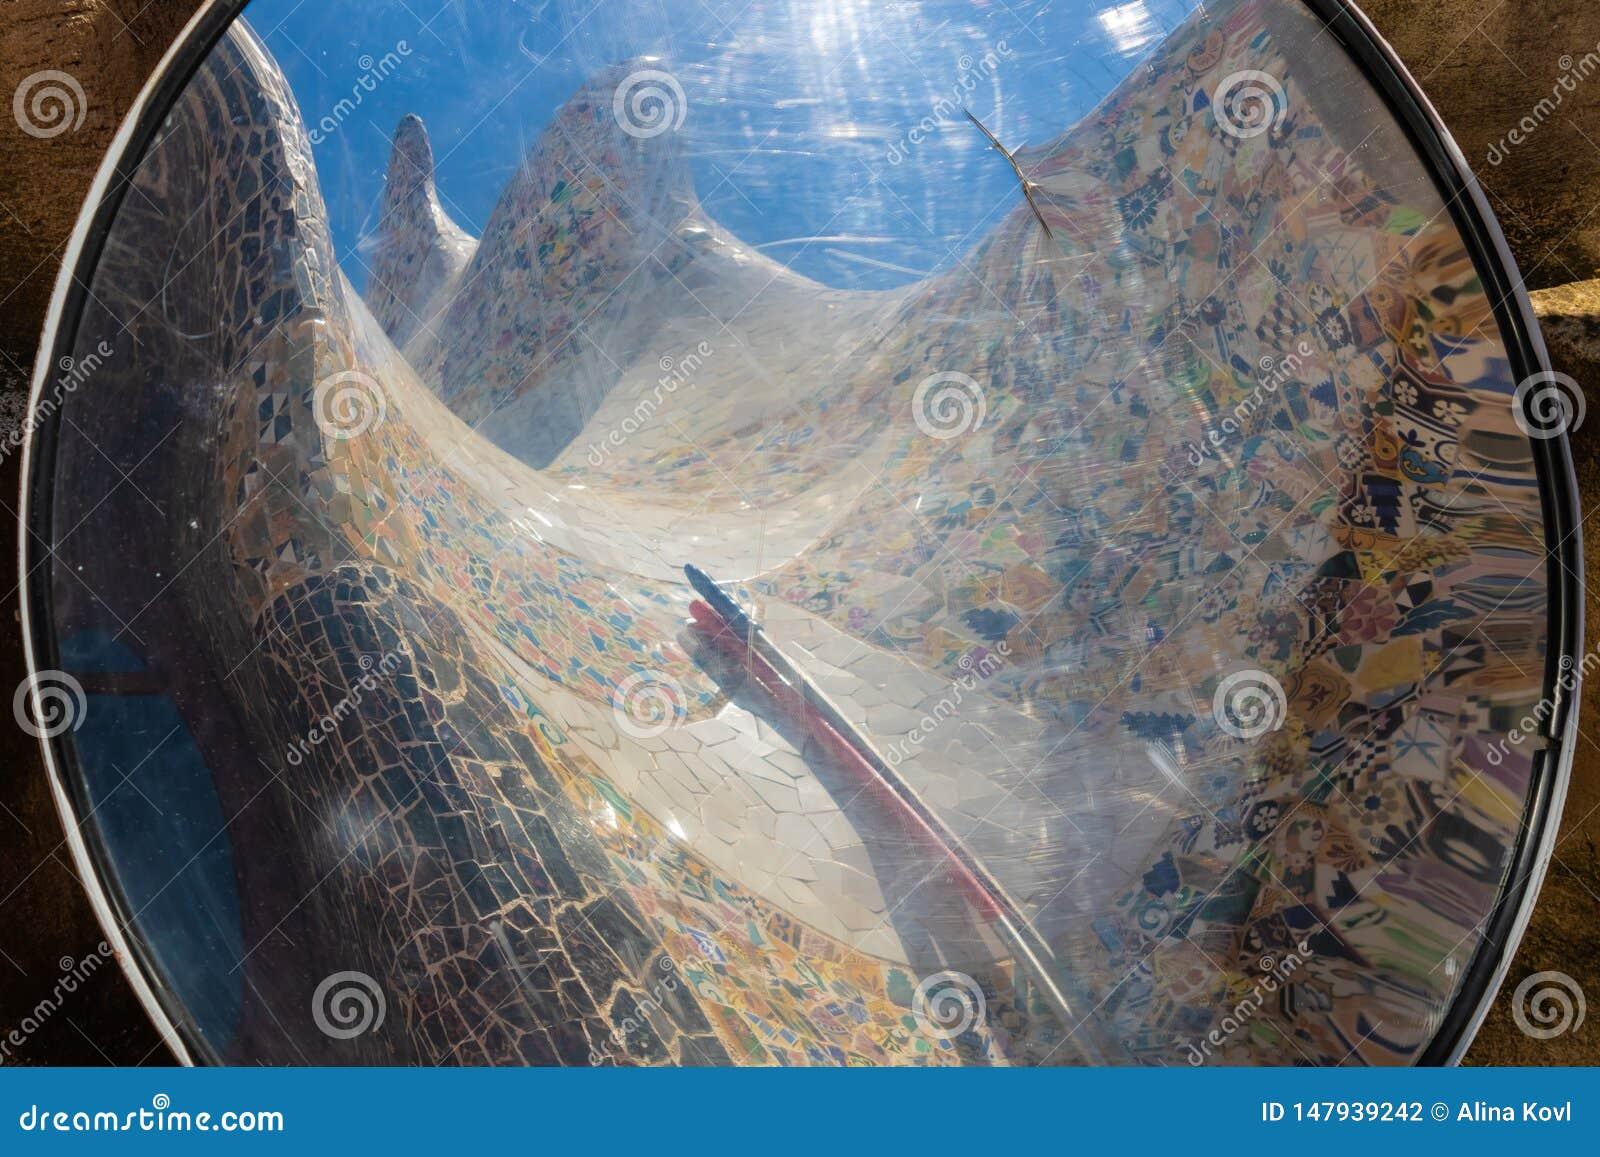 Reflection of the mosaics in Park Güell, Barcelona, Spain